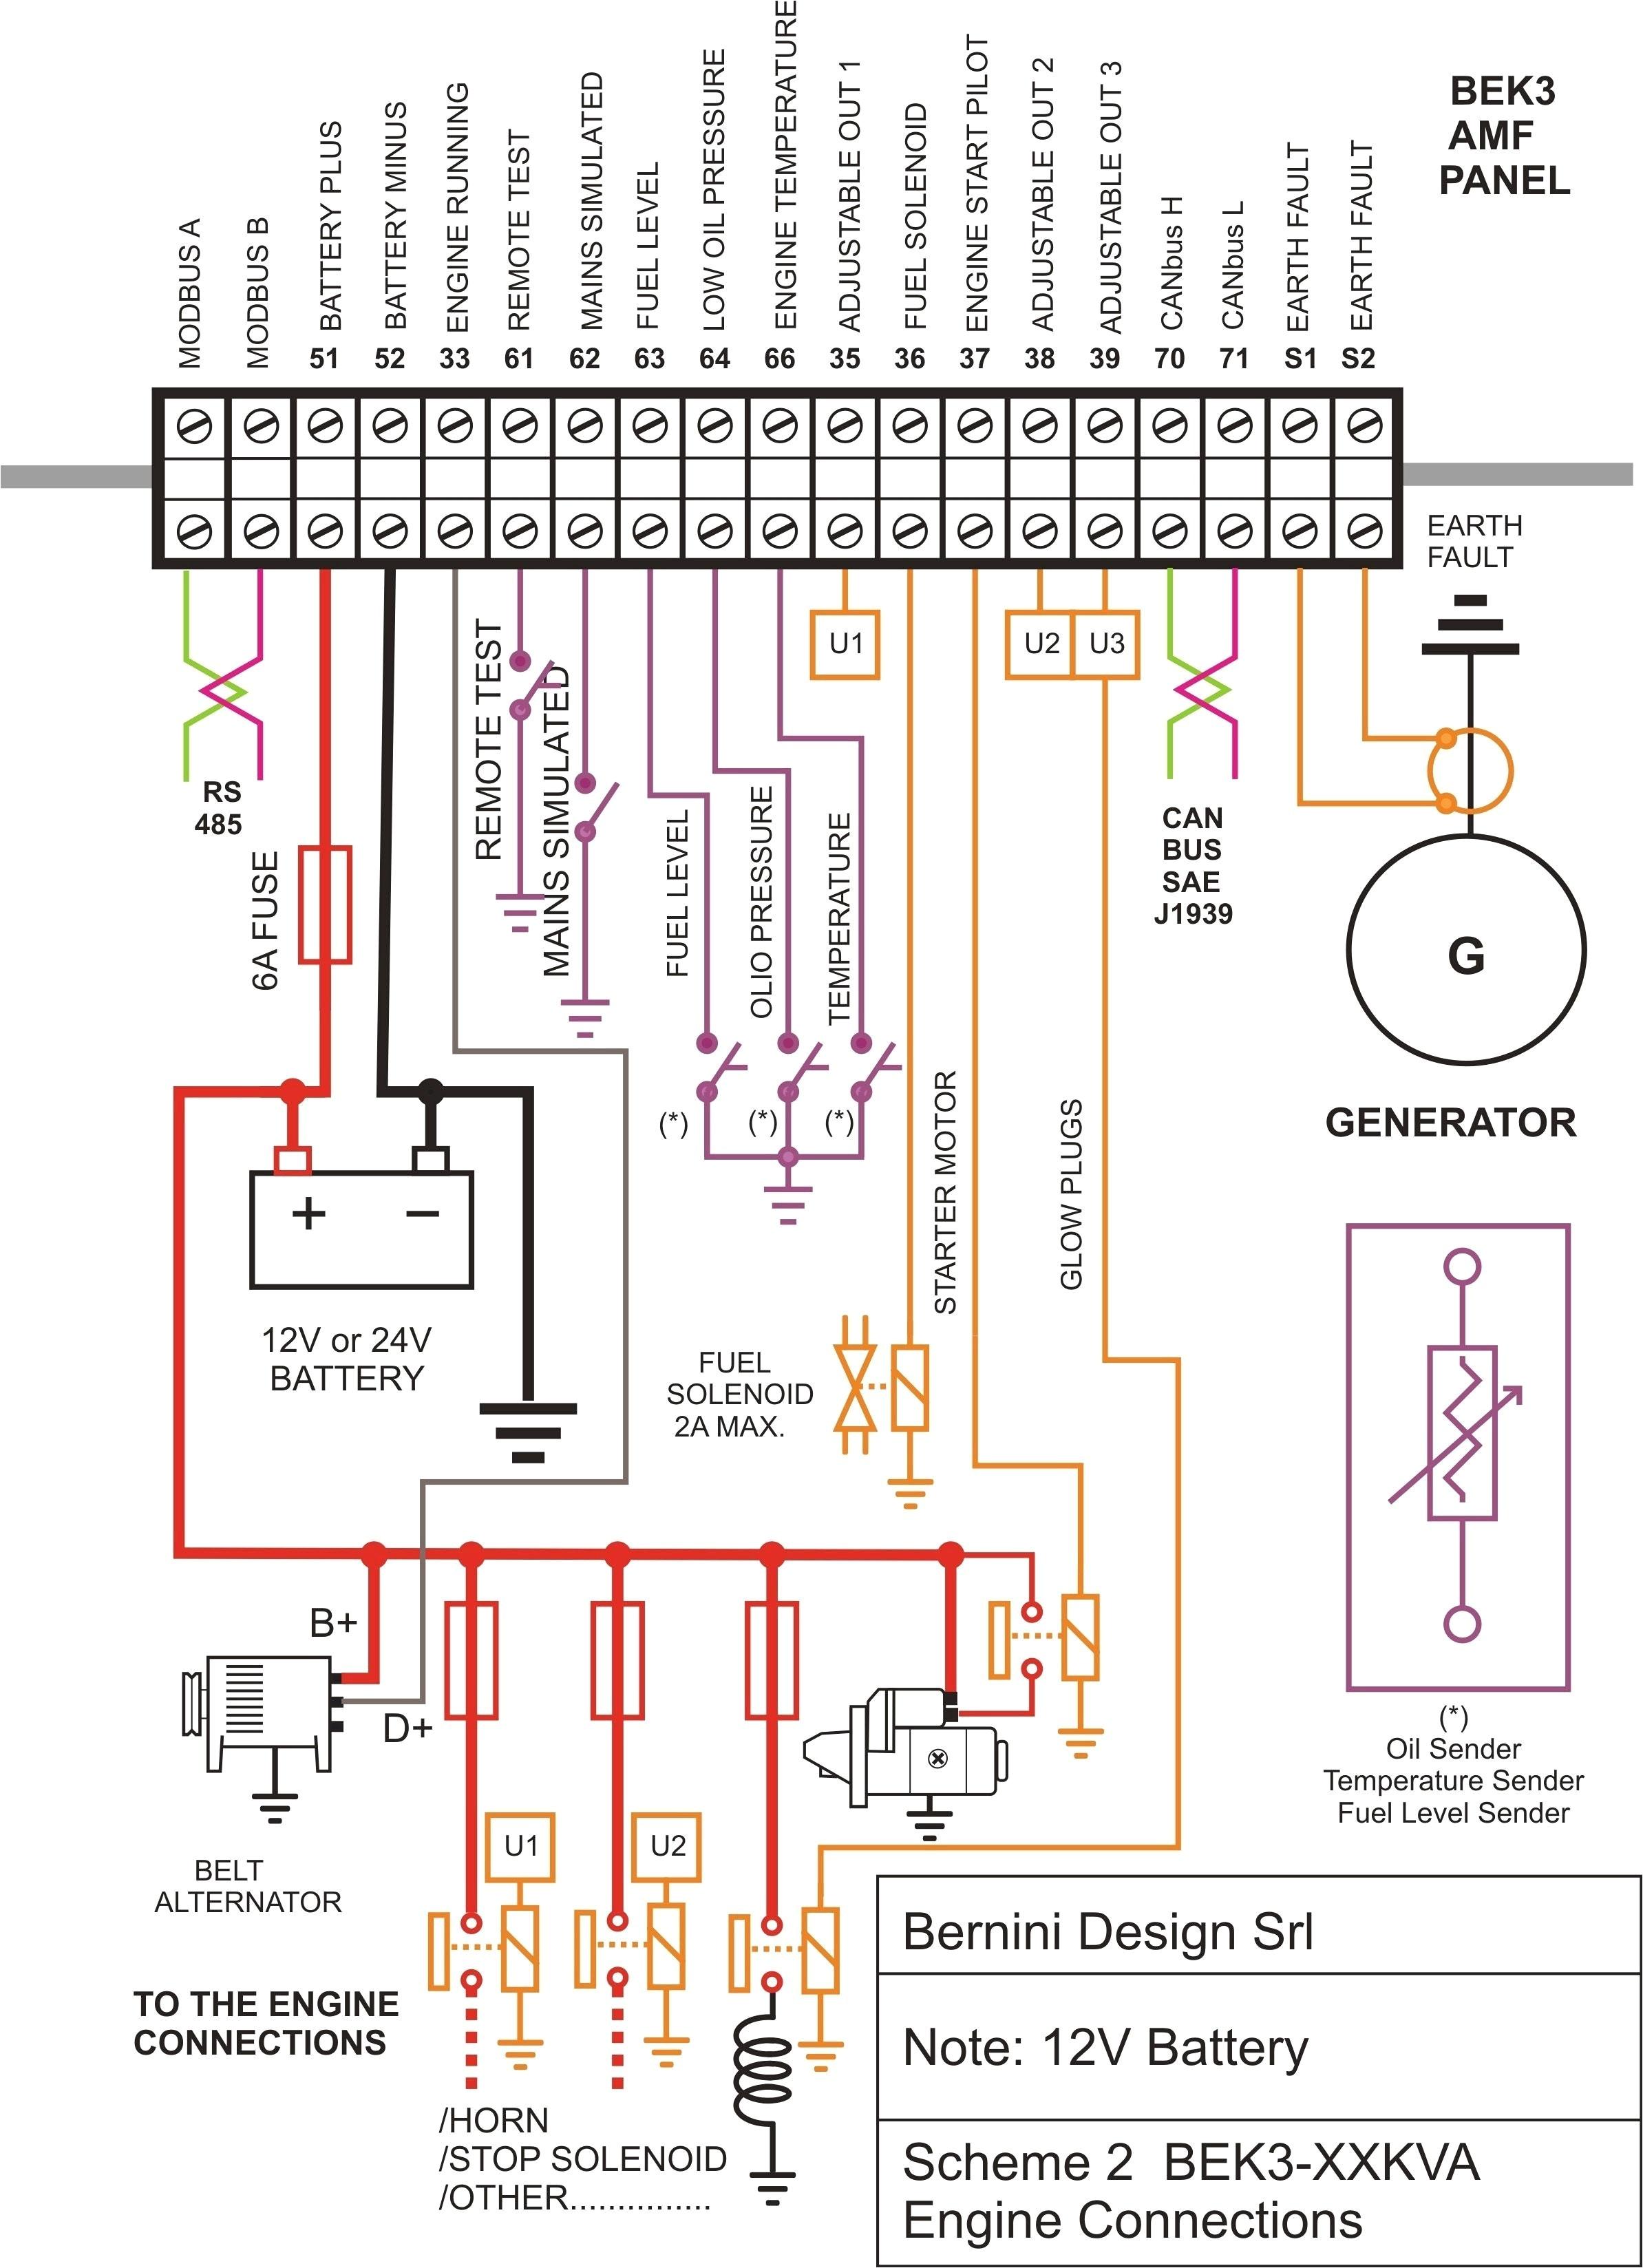 plc wiring diagram guide industrial wiring diagram electrical wiring diagram symbols 19m